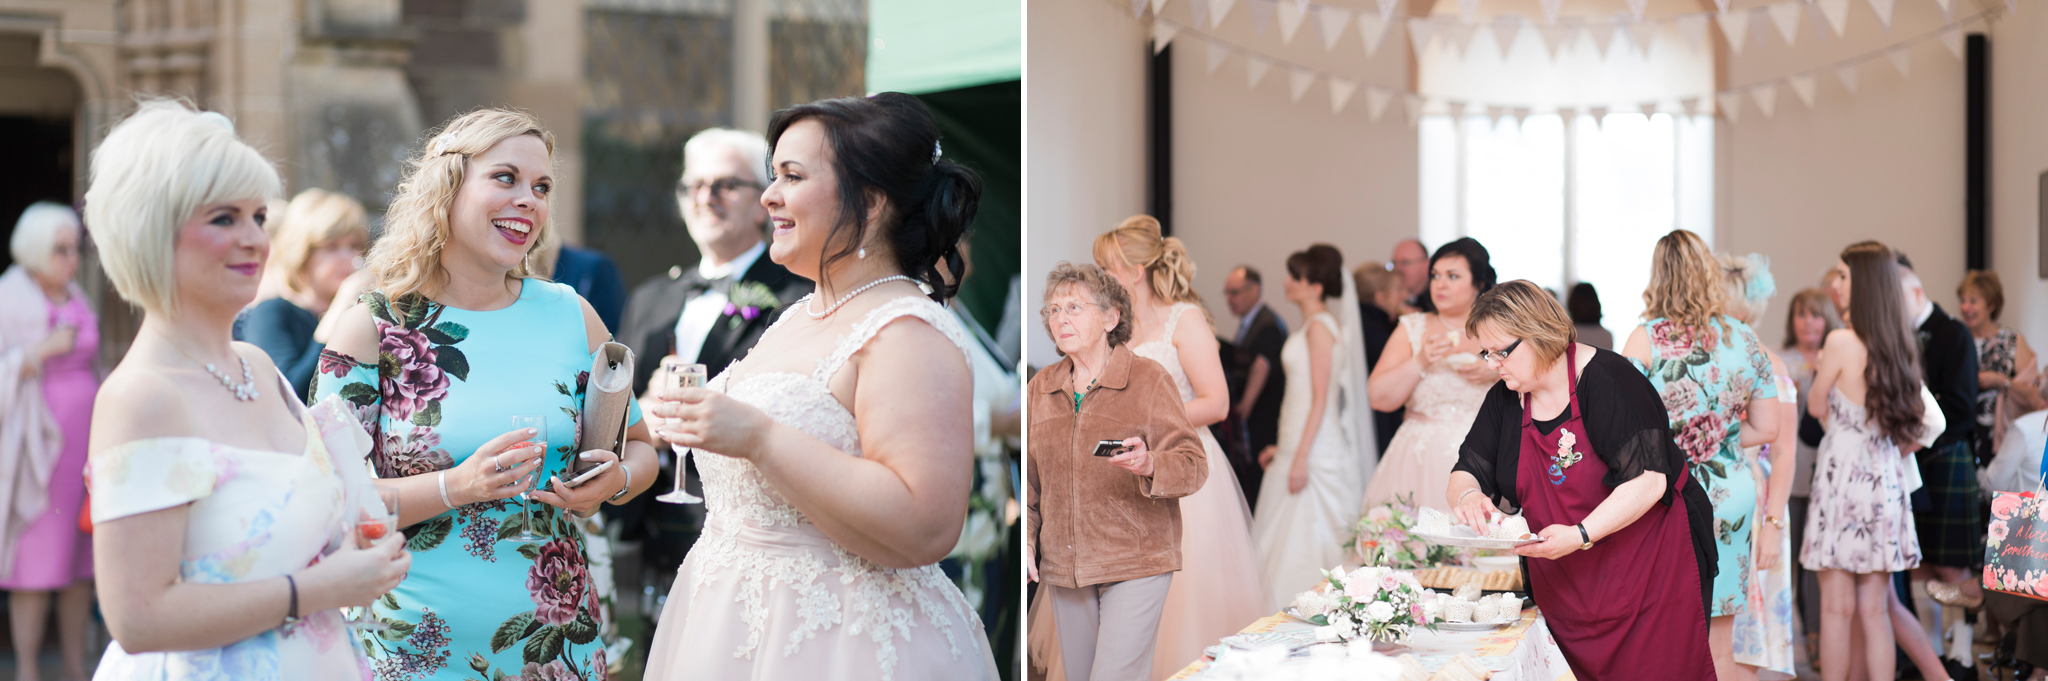 067-scotland-wedding-photographer.jpg